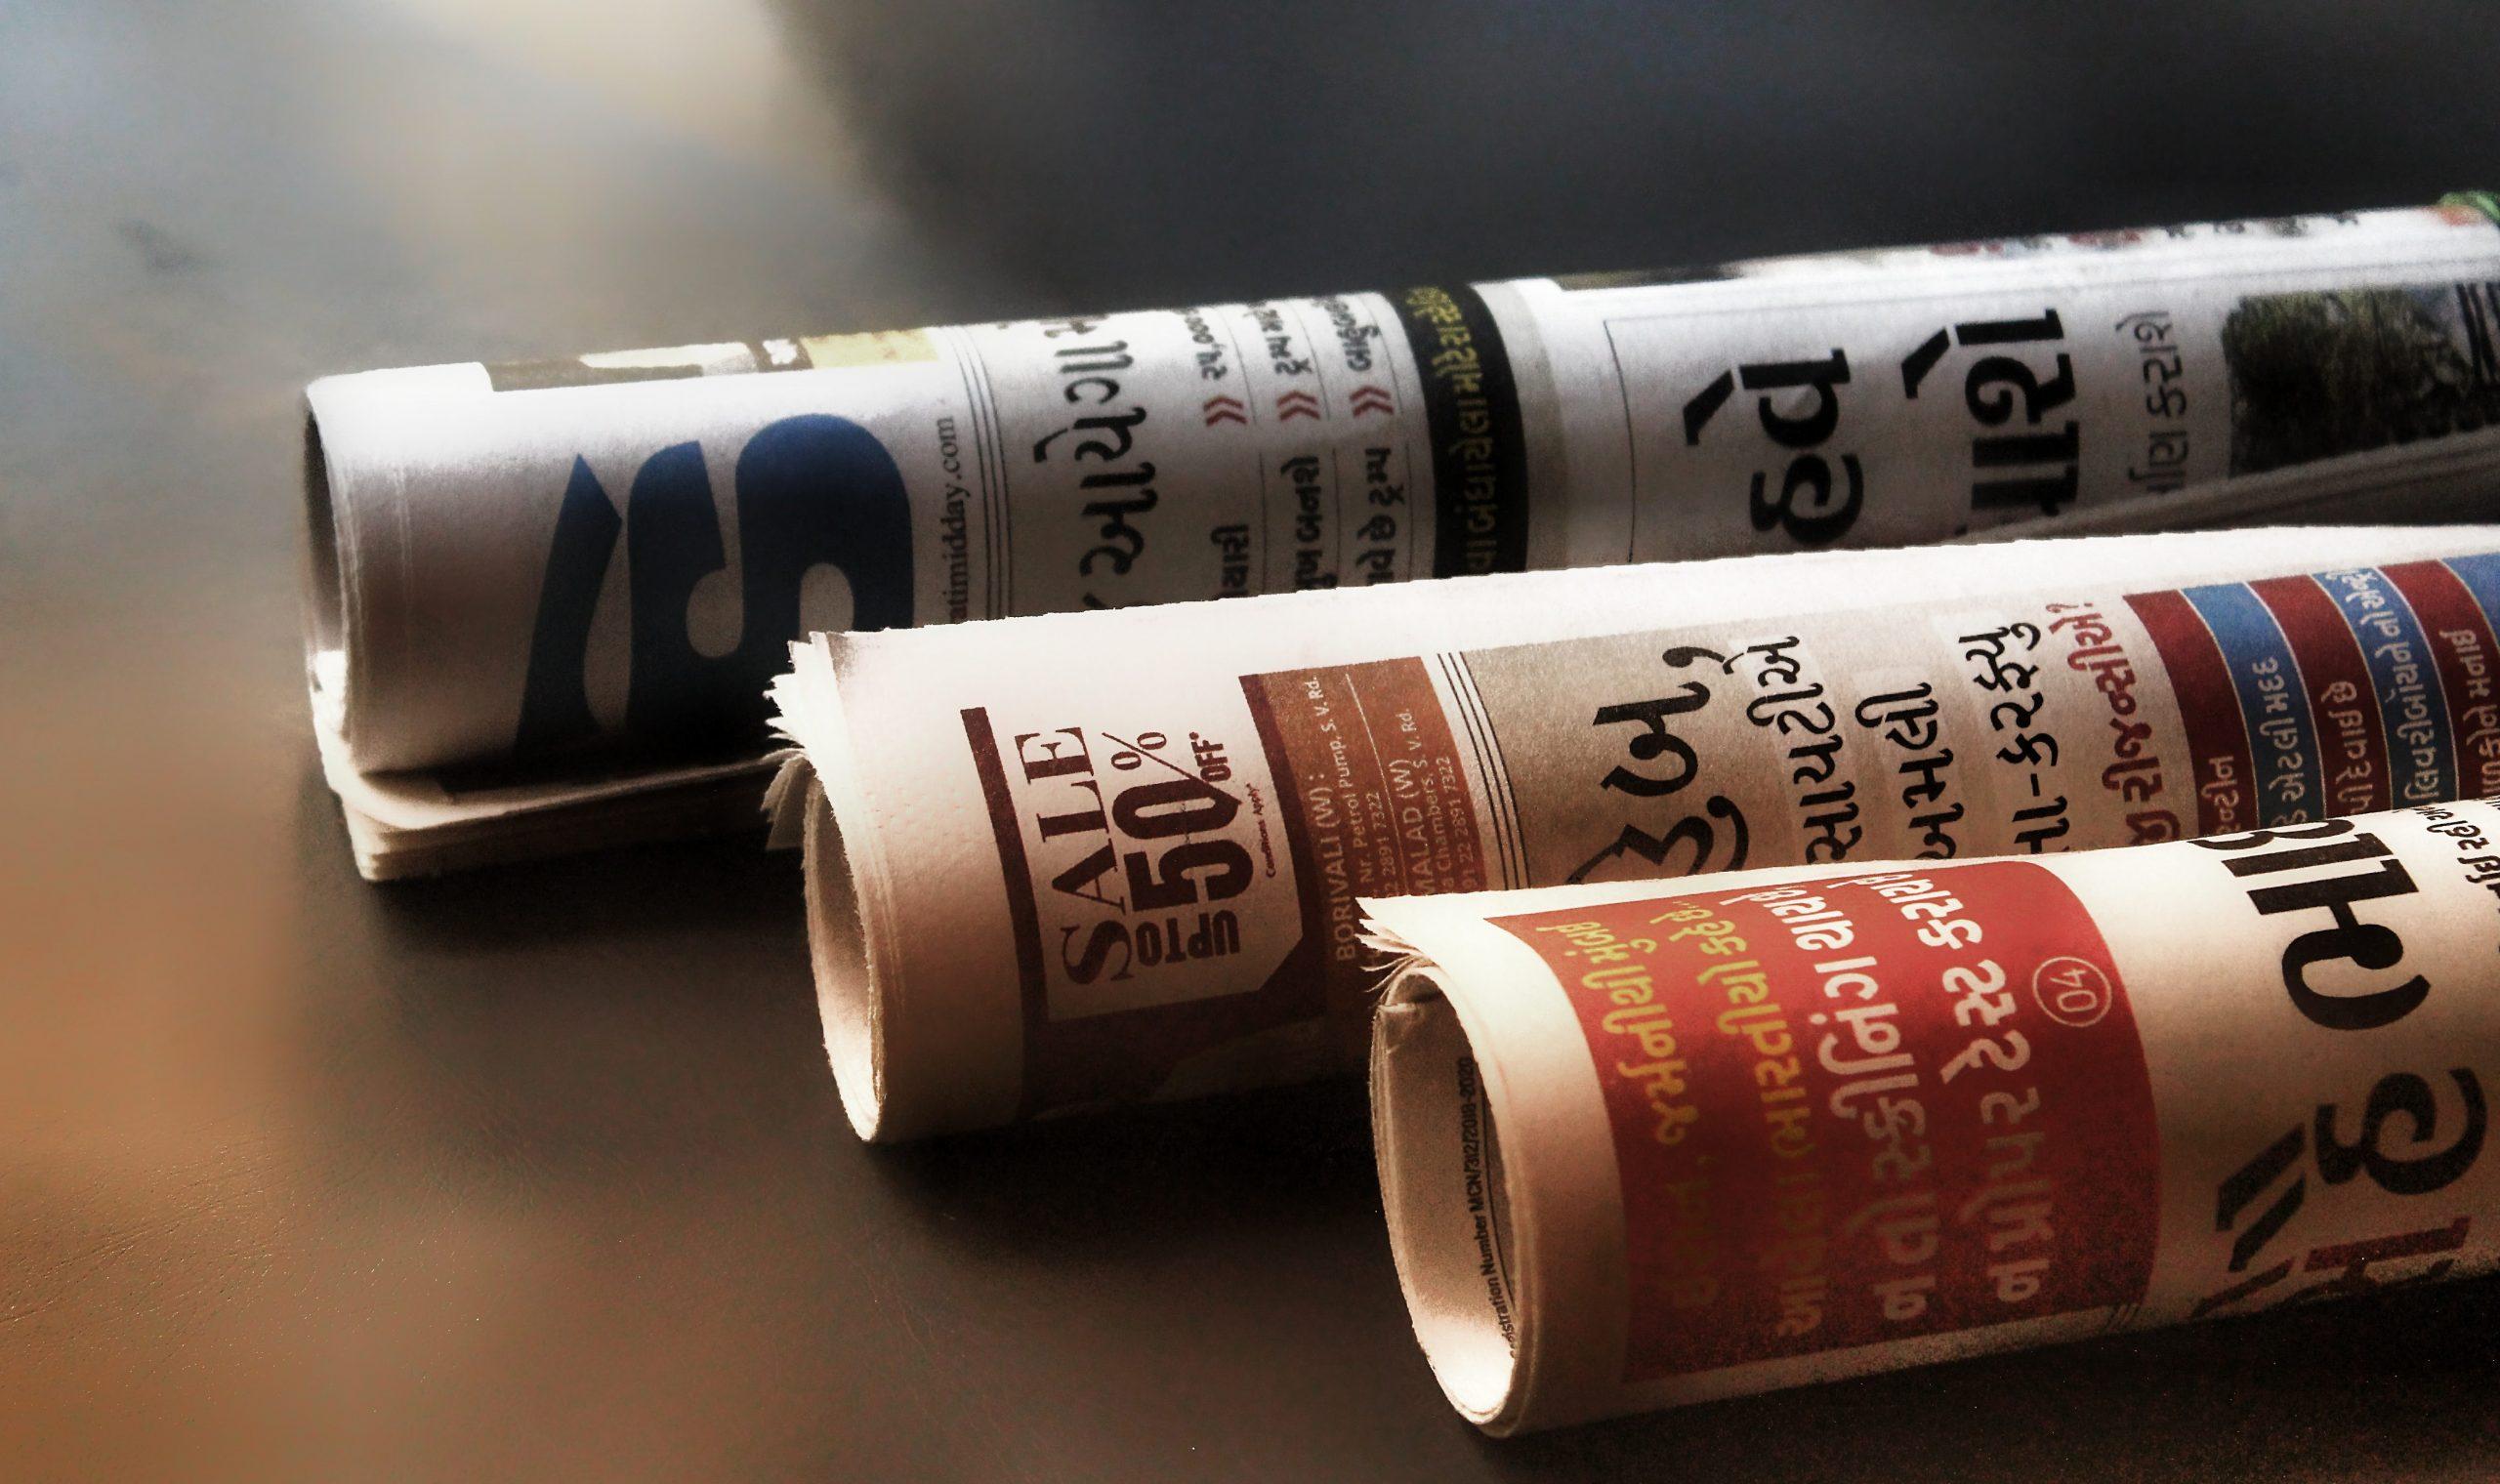 Rolls of newspaper